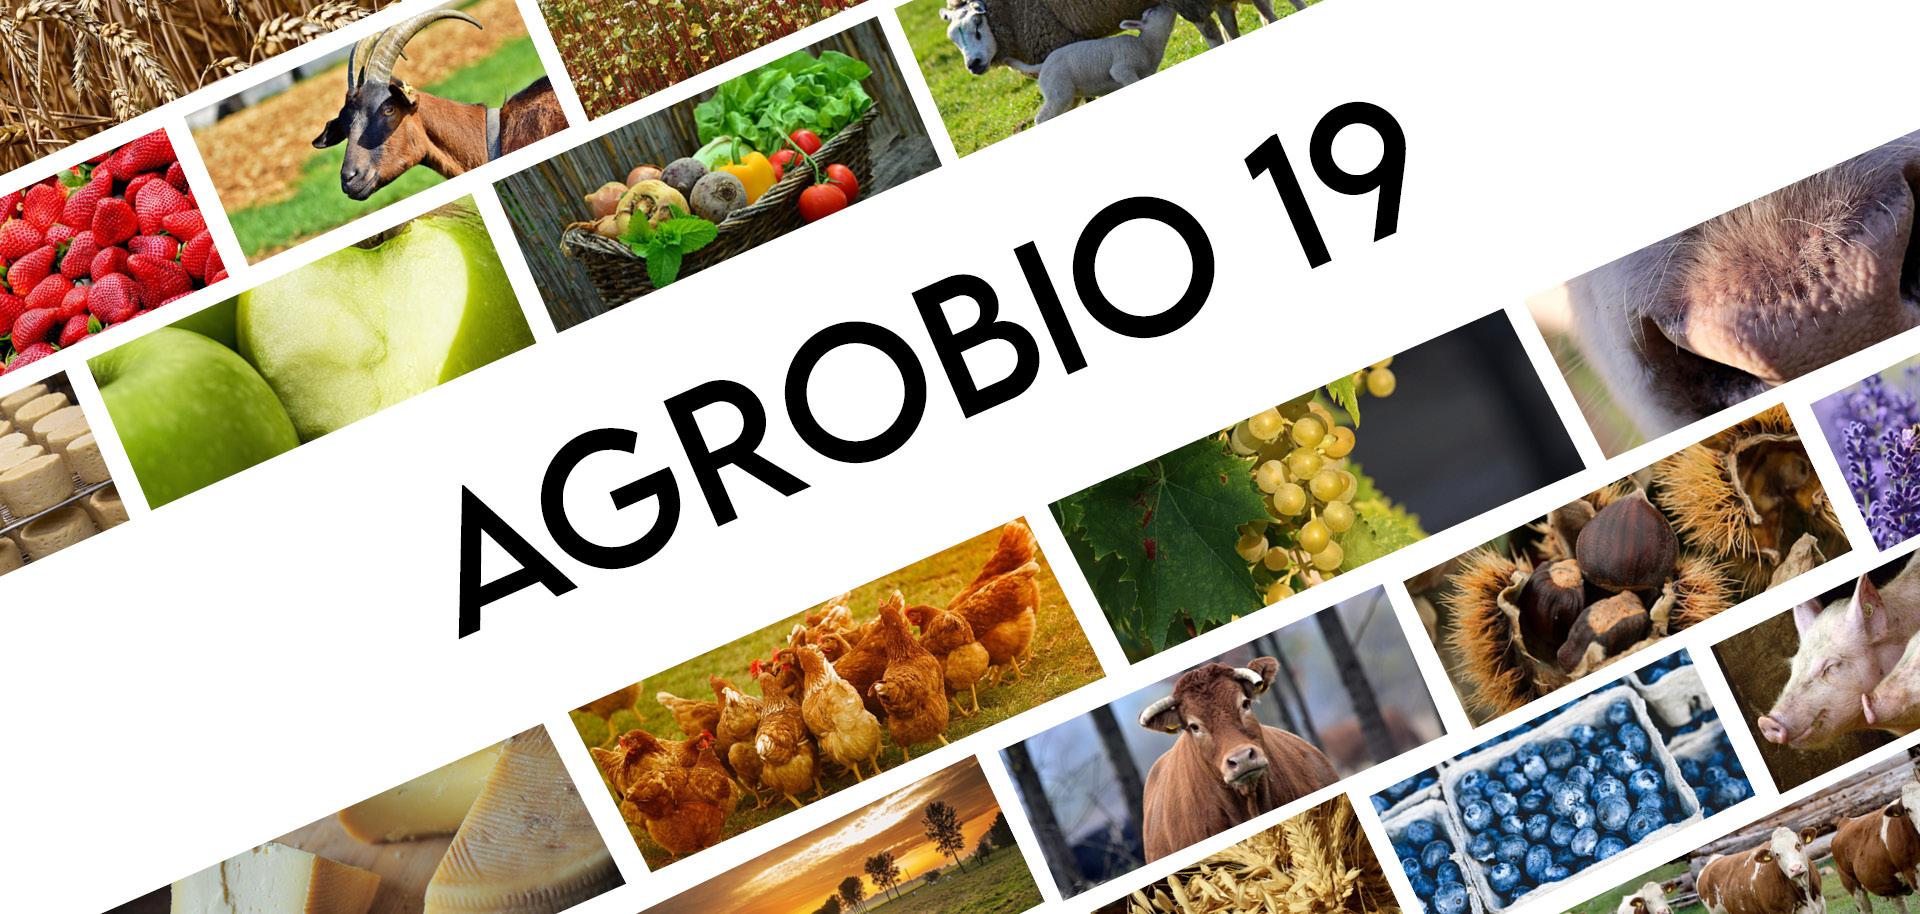 Agrobio 19